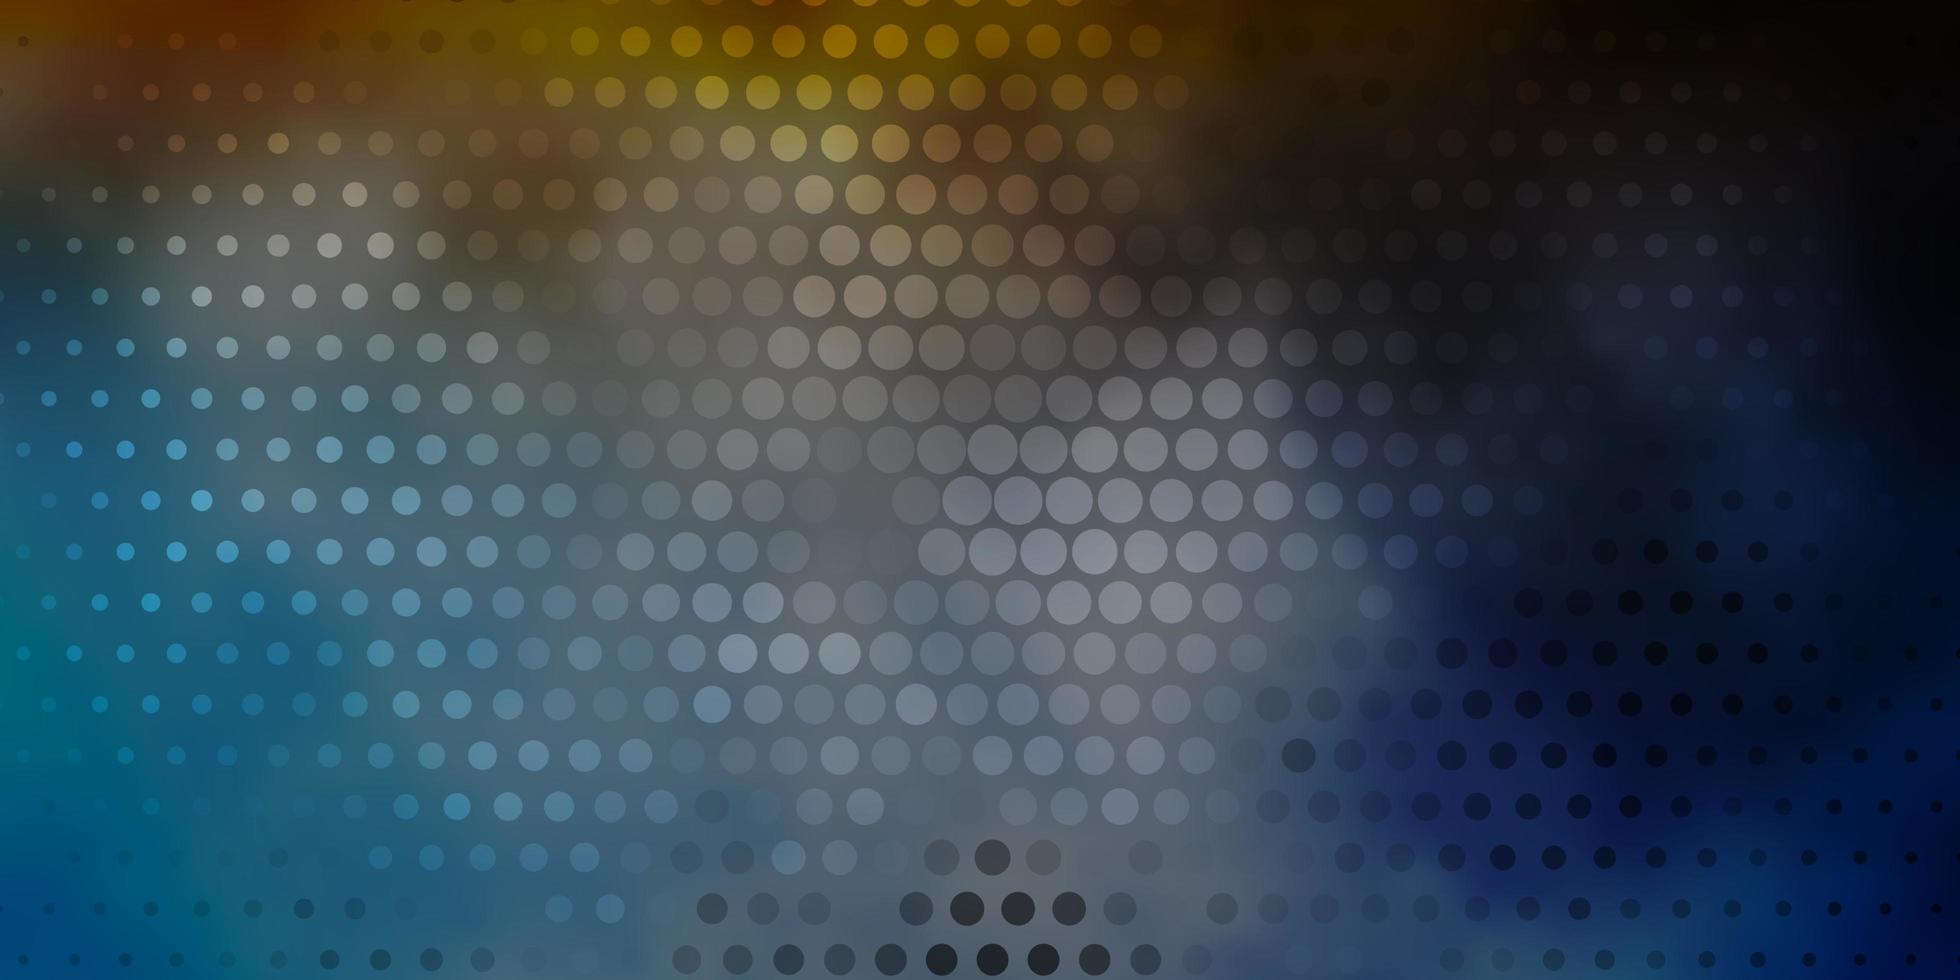 donkerblauwe, gele achtergrond met cirkels. vector